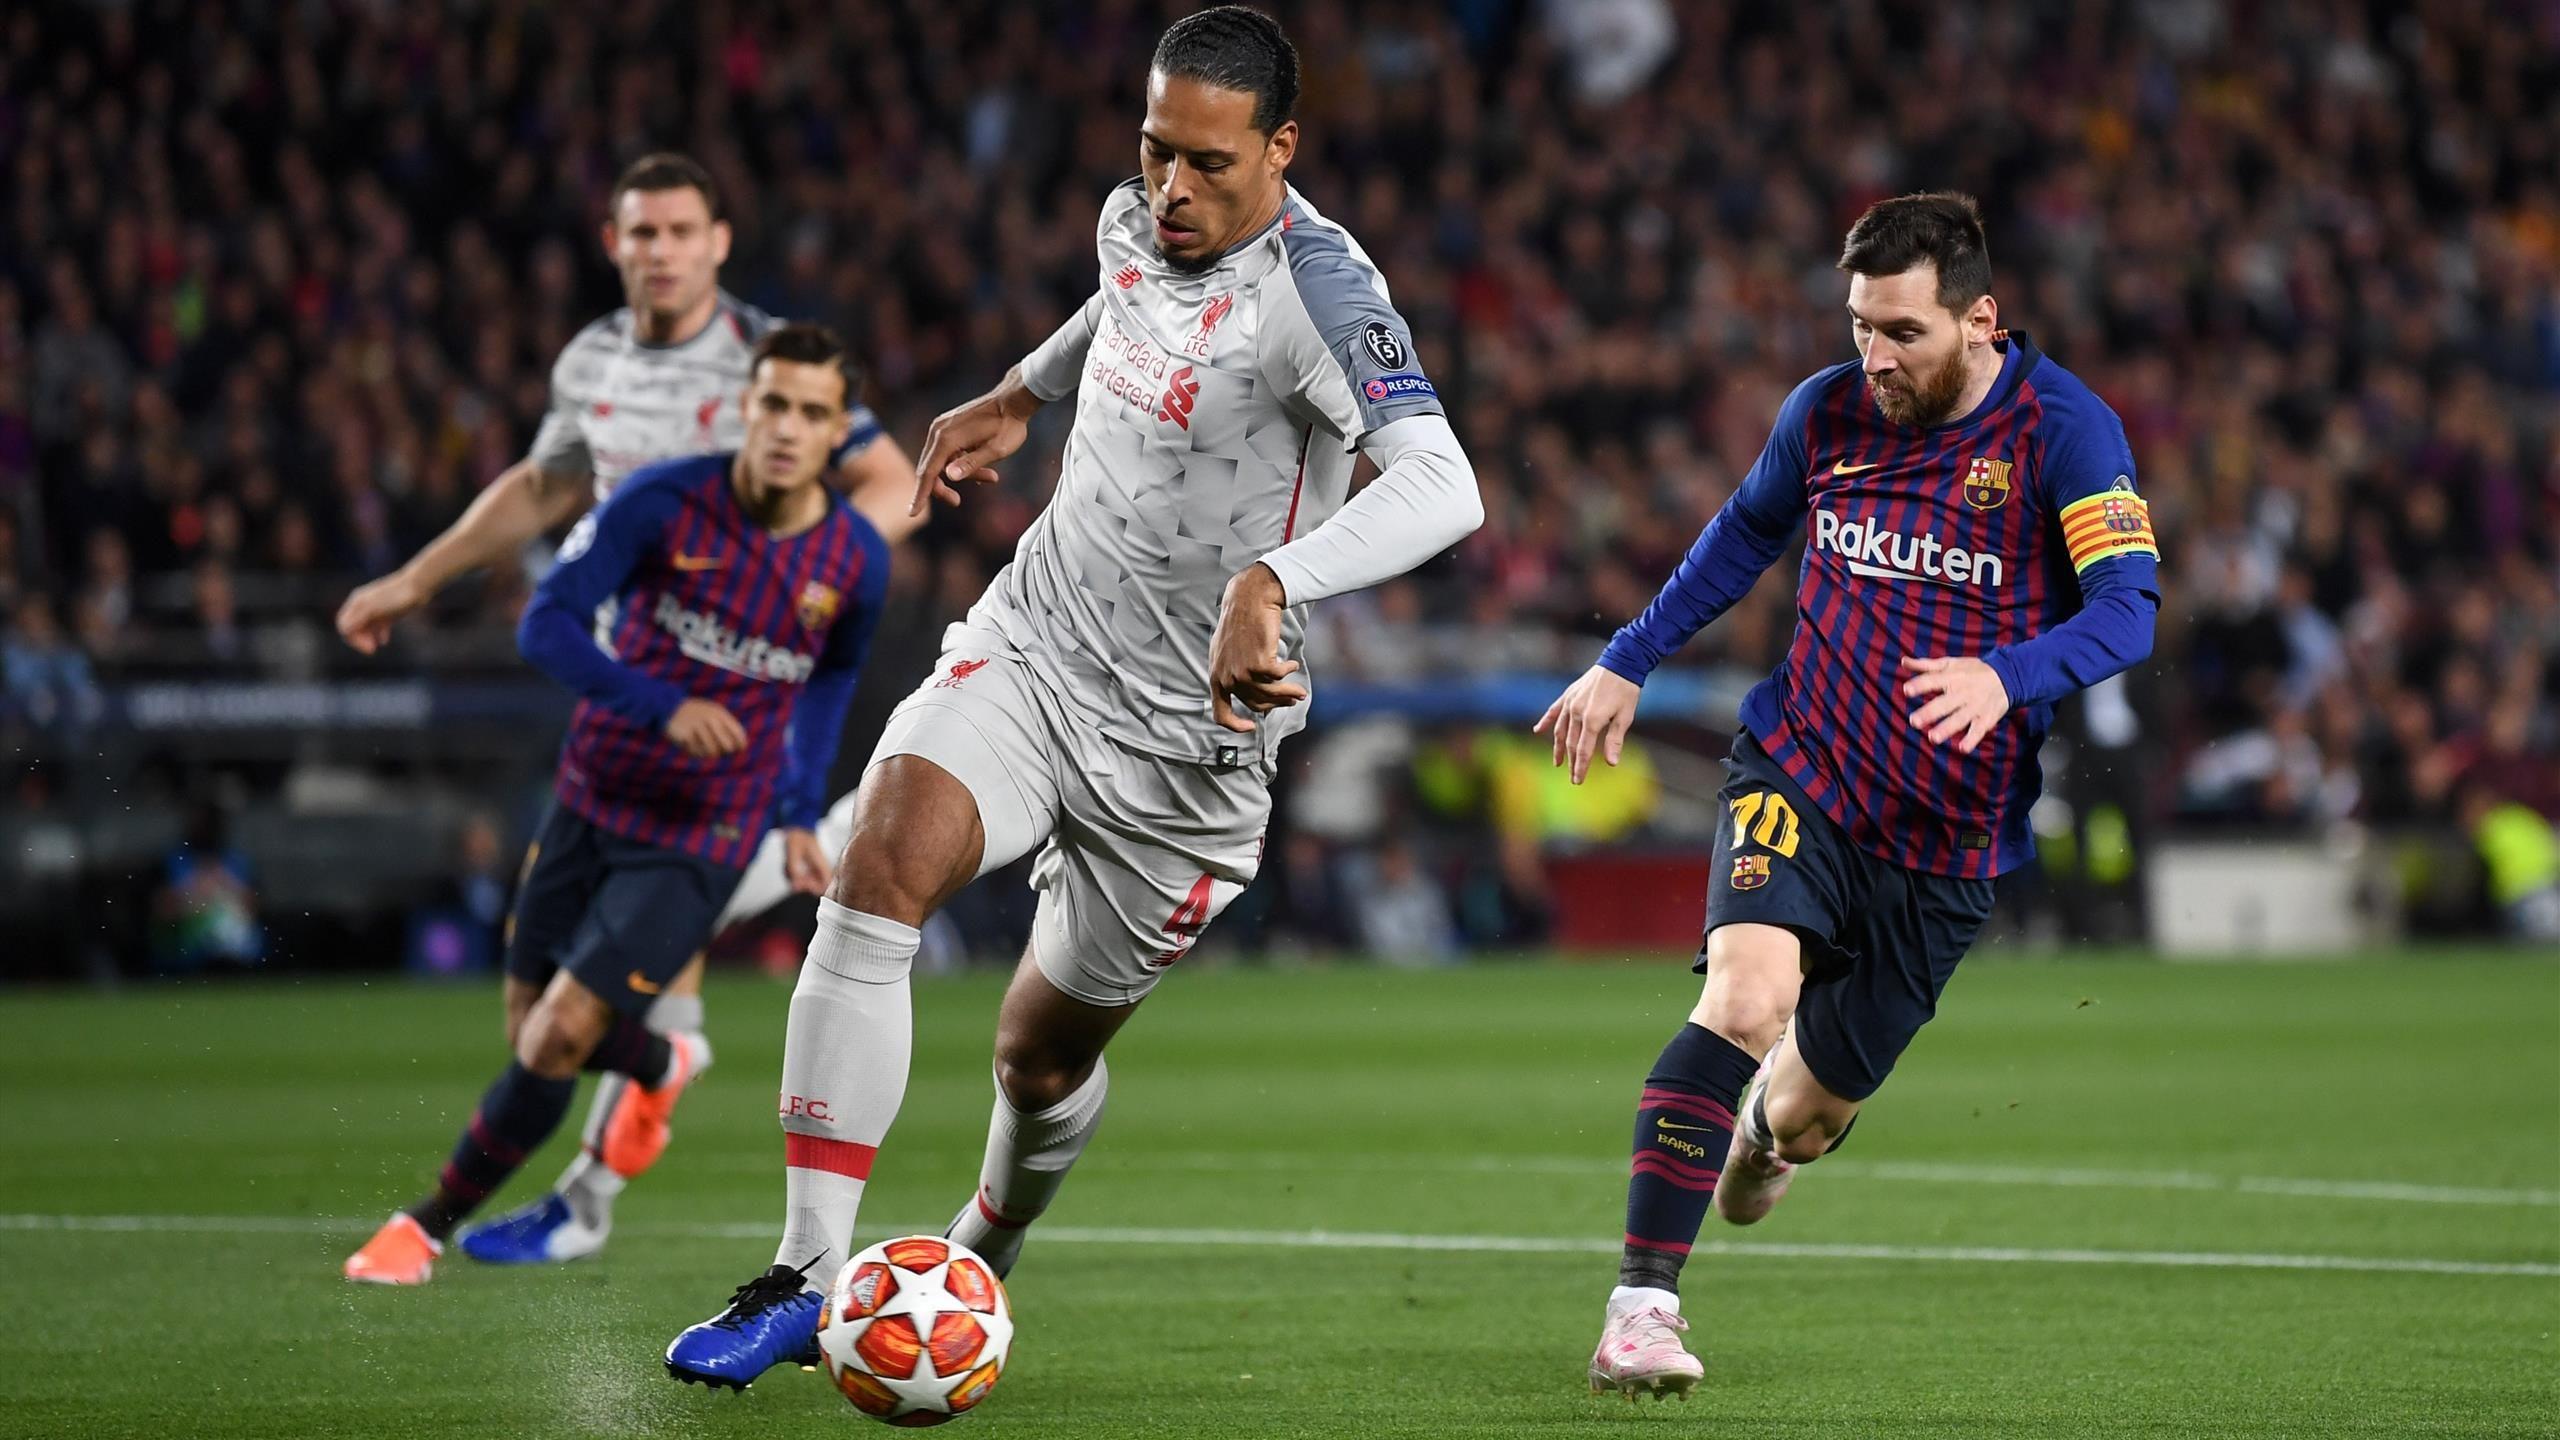 Virgil Van Dijk Messi , HD Wallpaper & Backgrounds